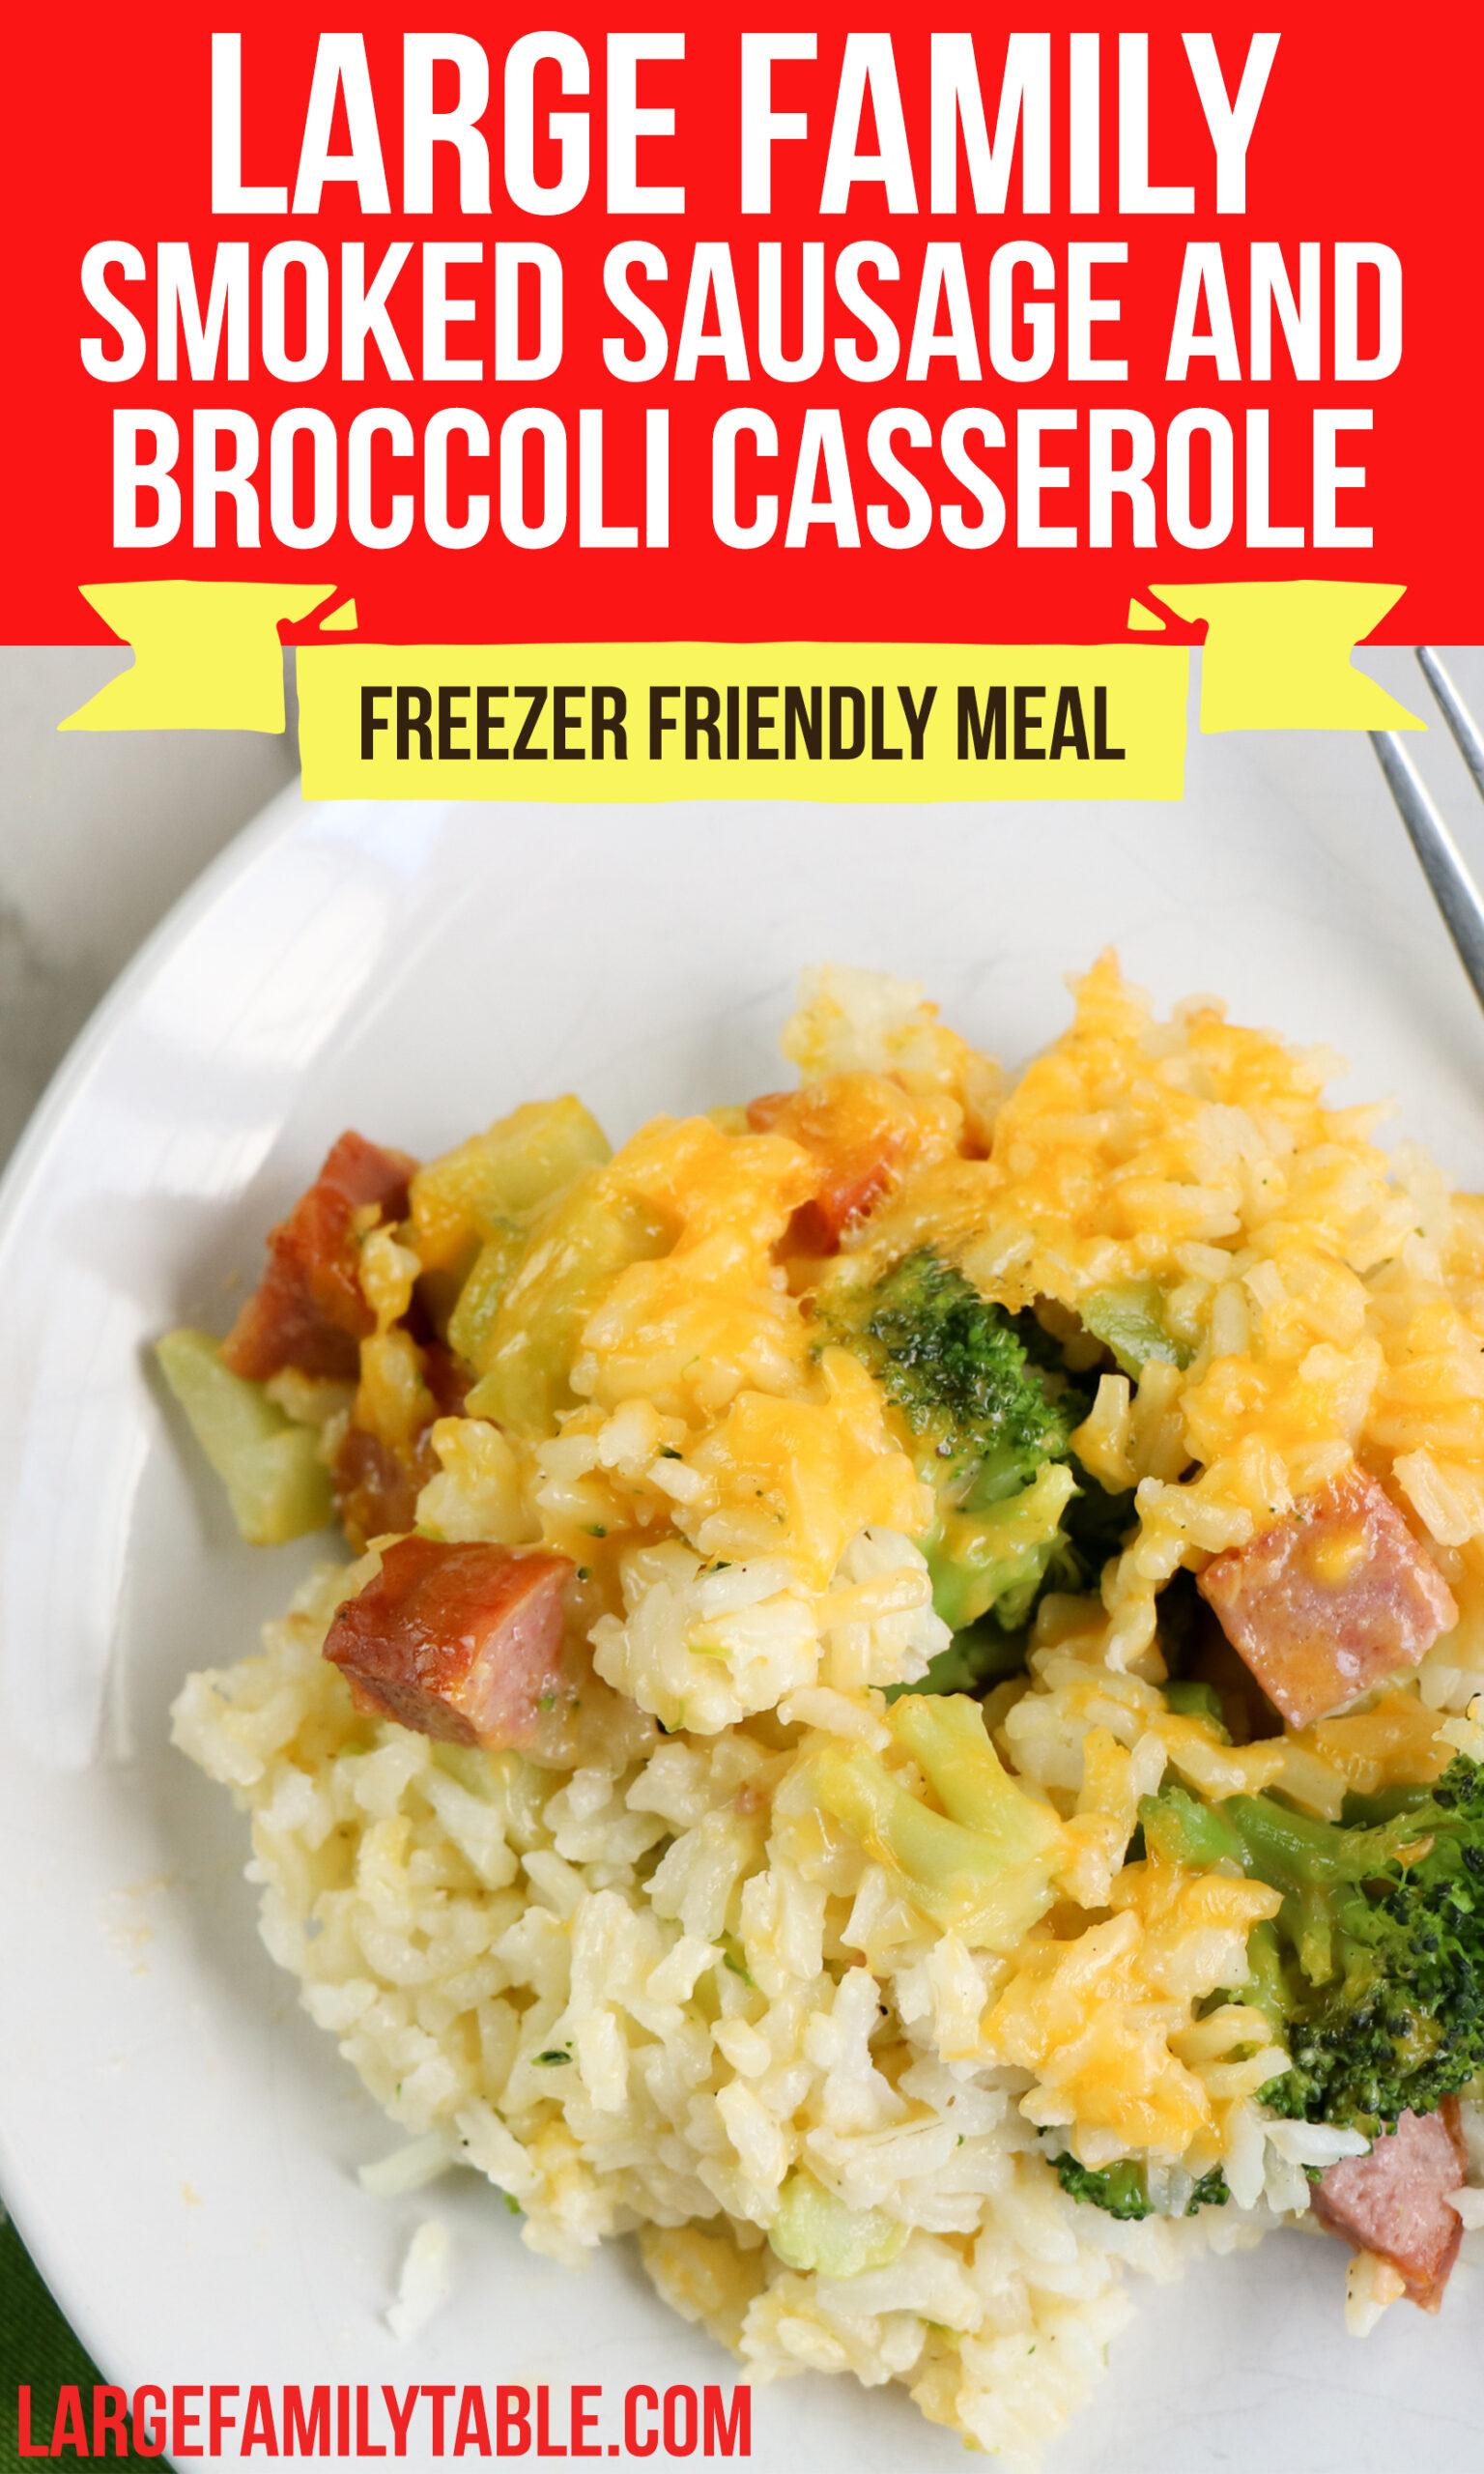 Large Family Smoked Sausage and Broccoli Casserol